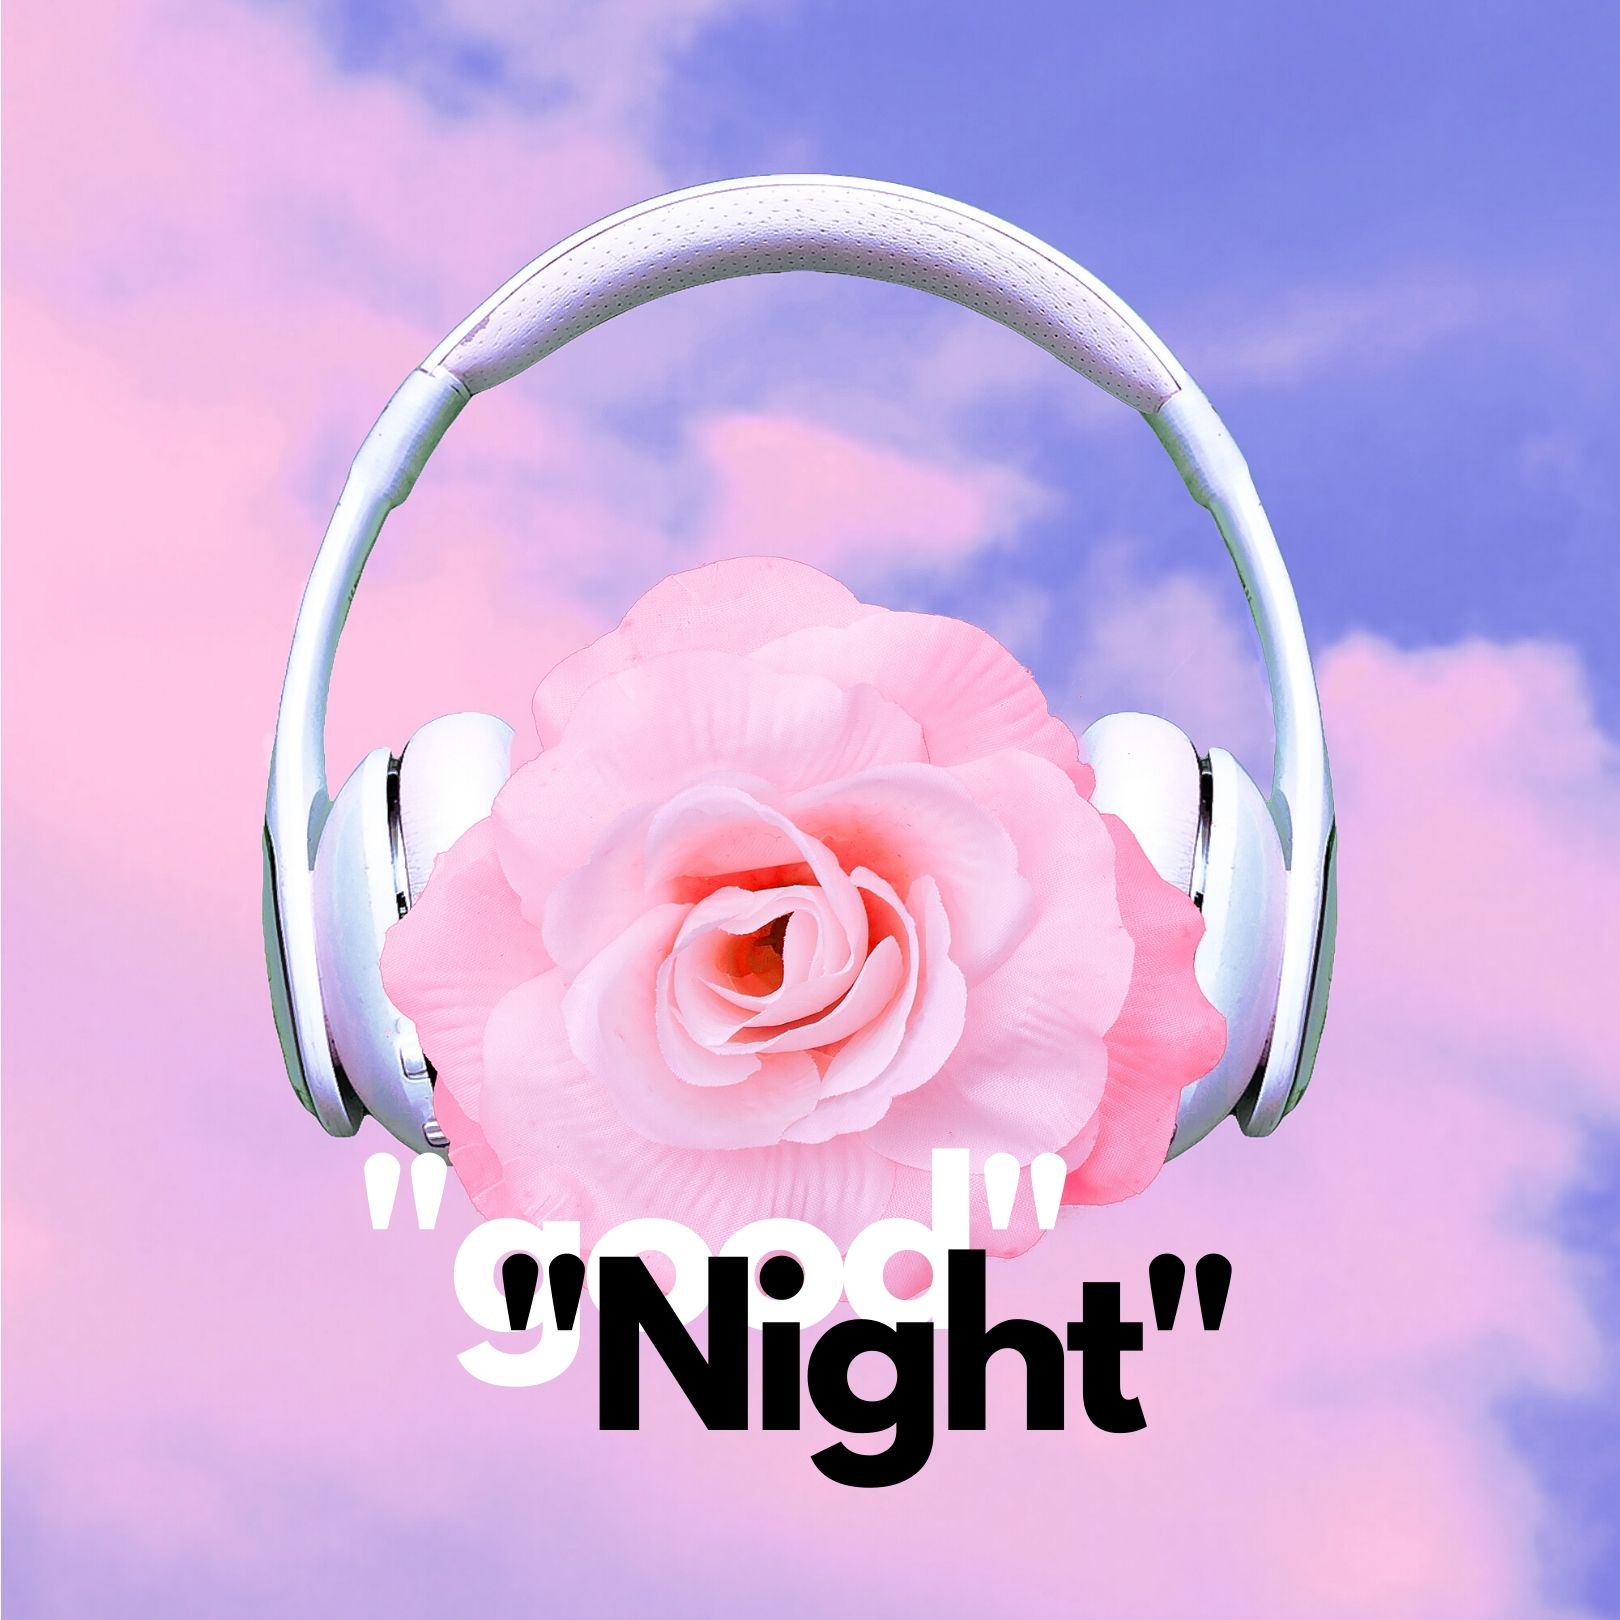 Good Night rose image hd full HD free download.